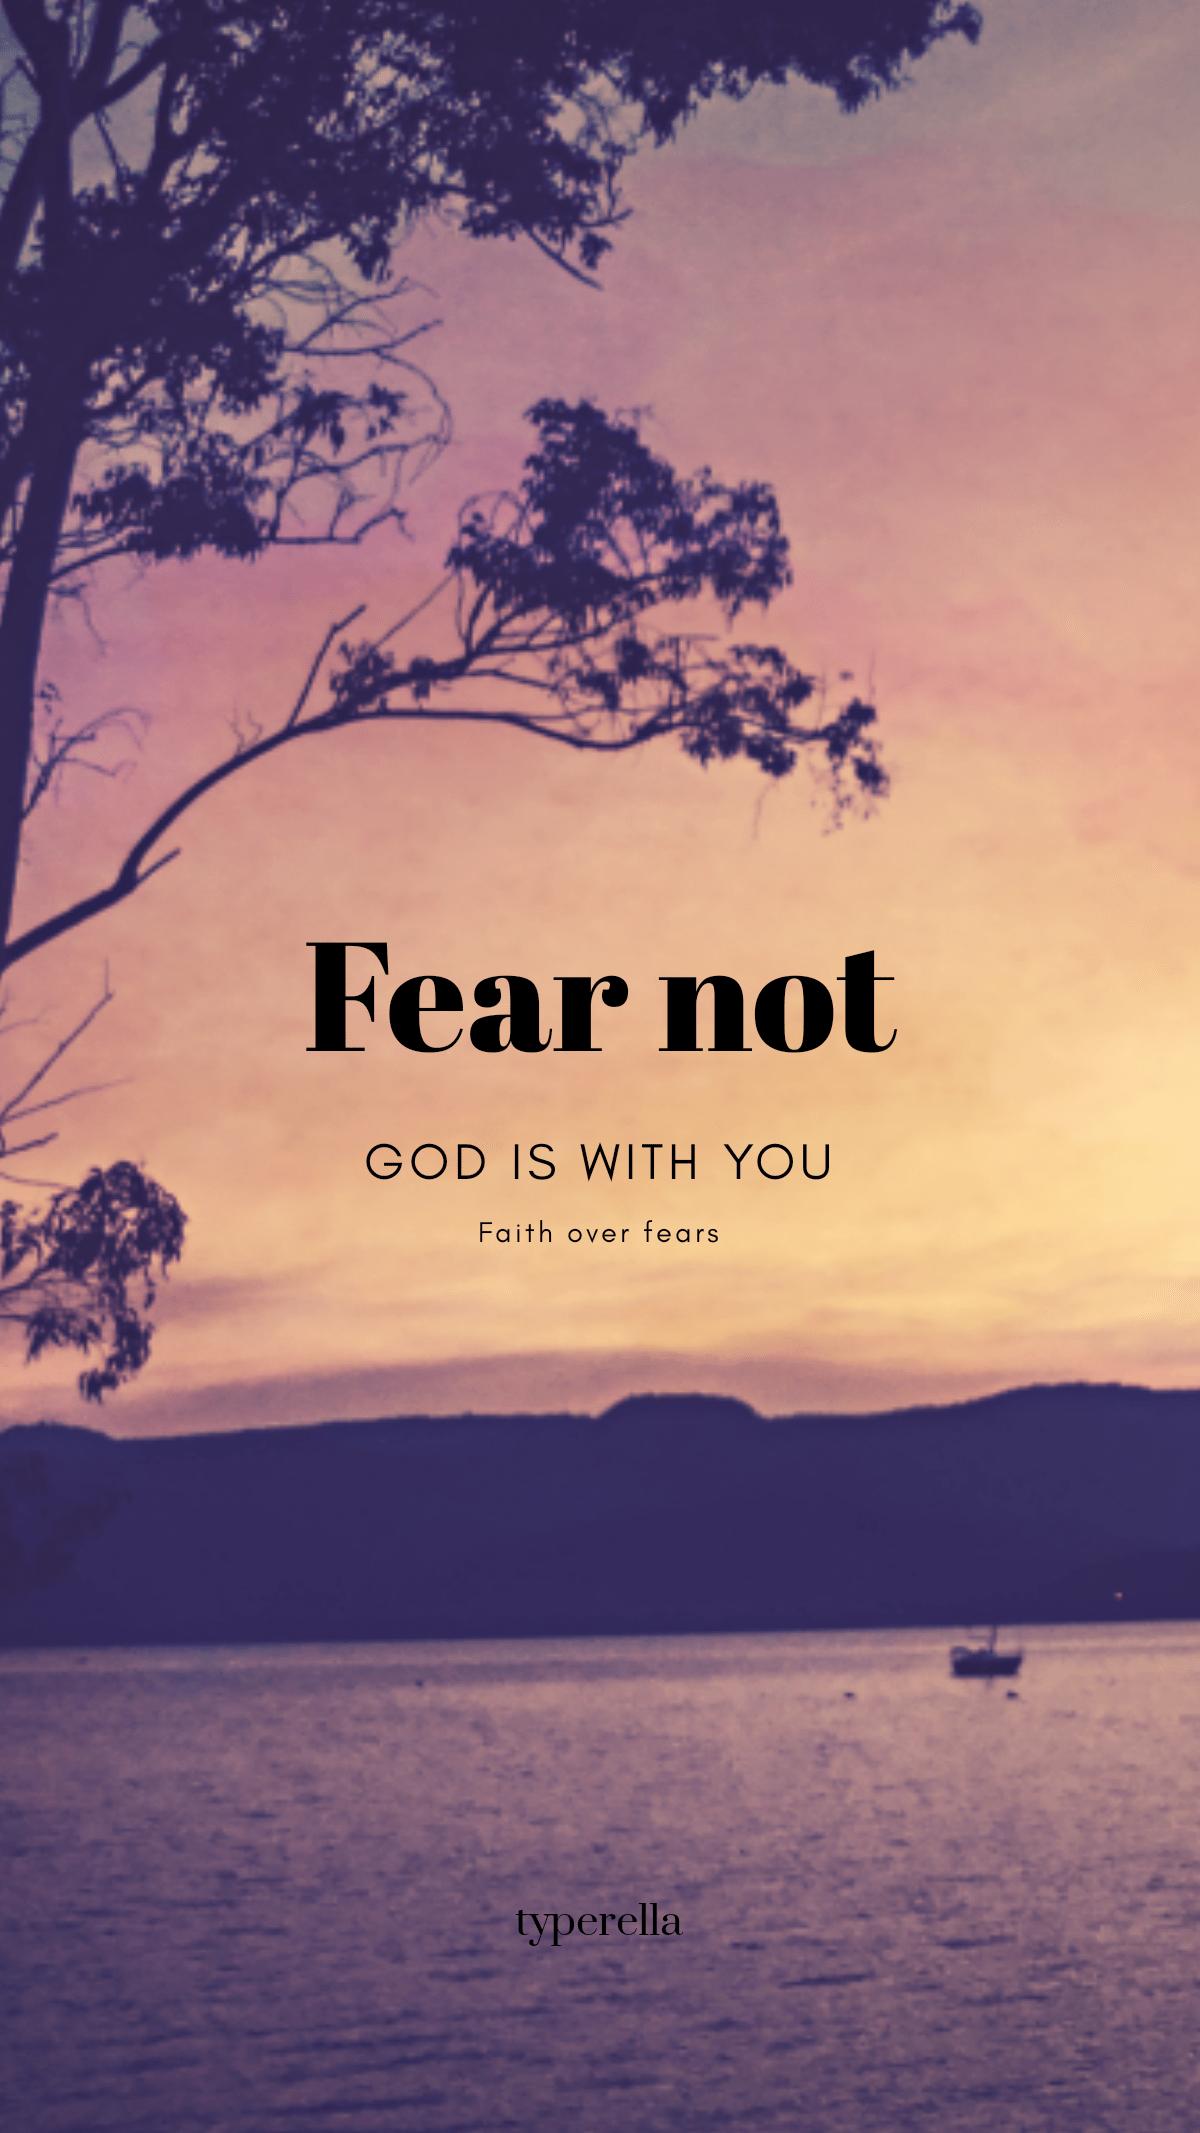 Inspirational Bible Verse Wallpapers Top Free Inspirational